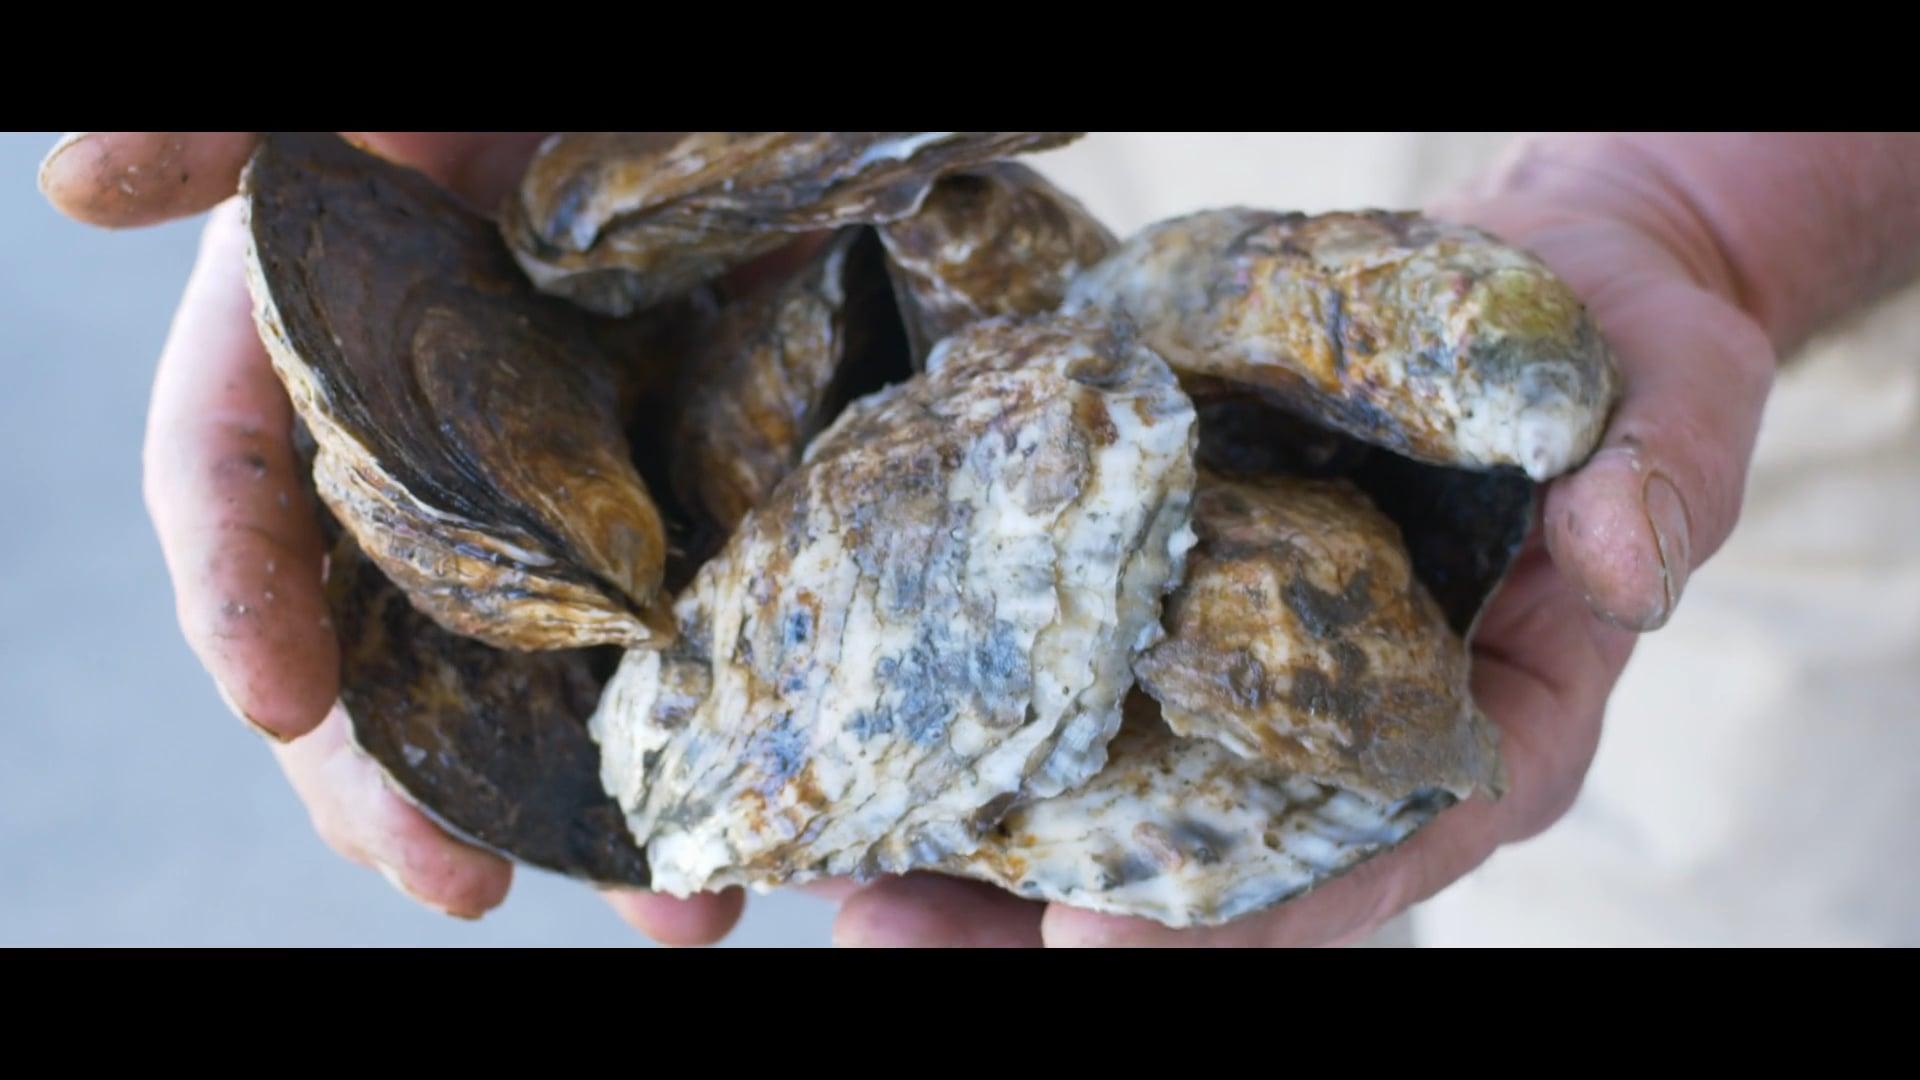 Briarpatch Shellfish Company